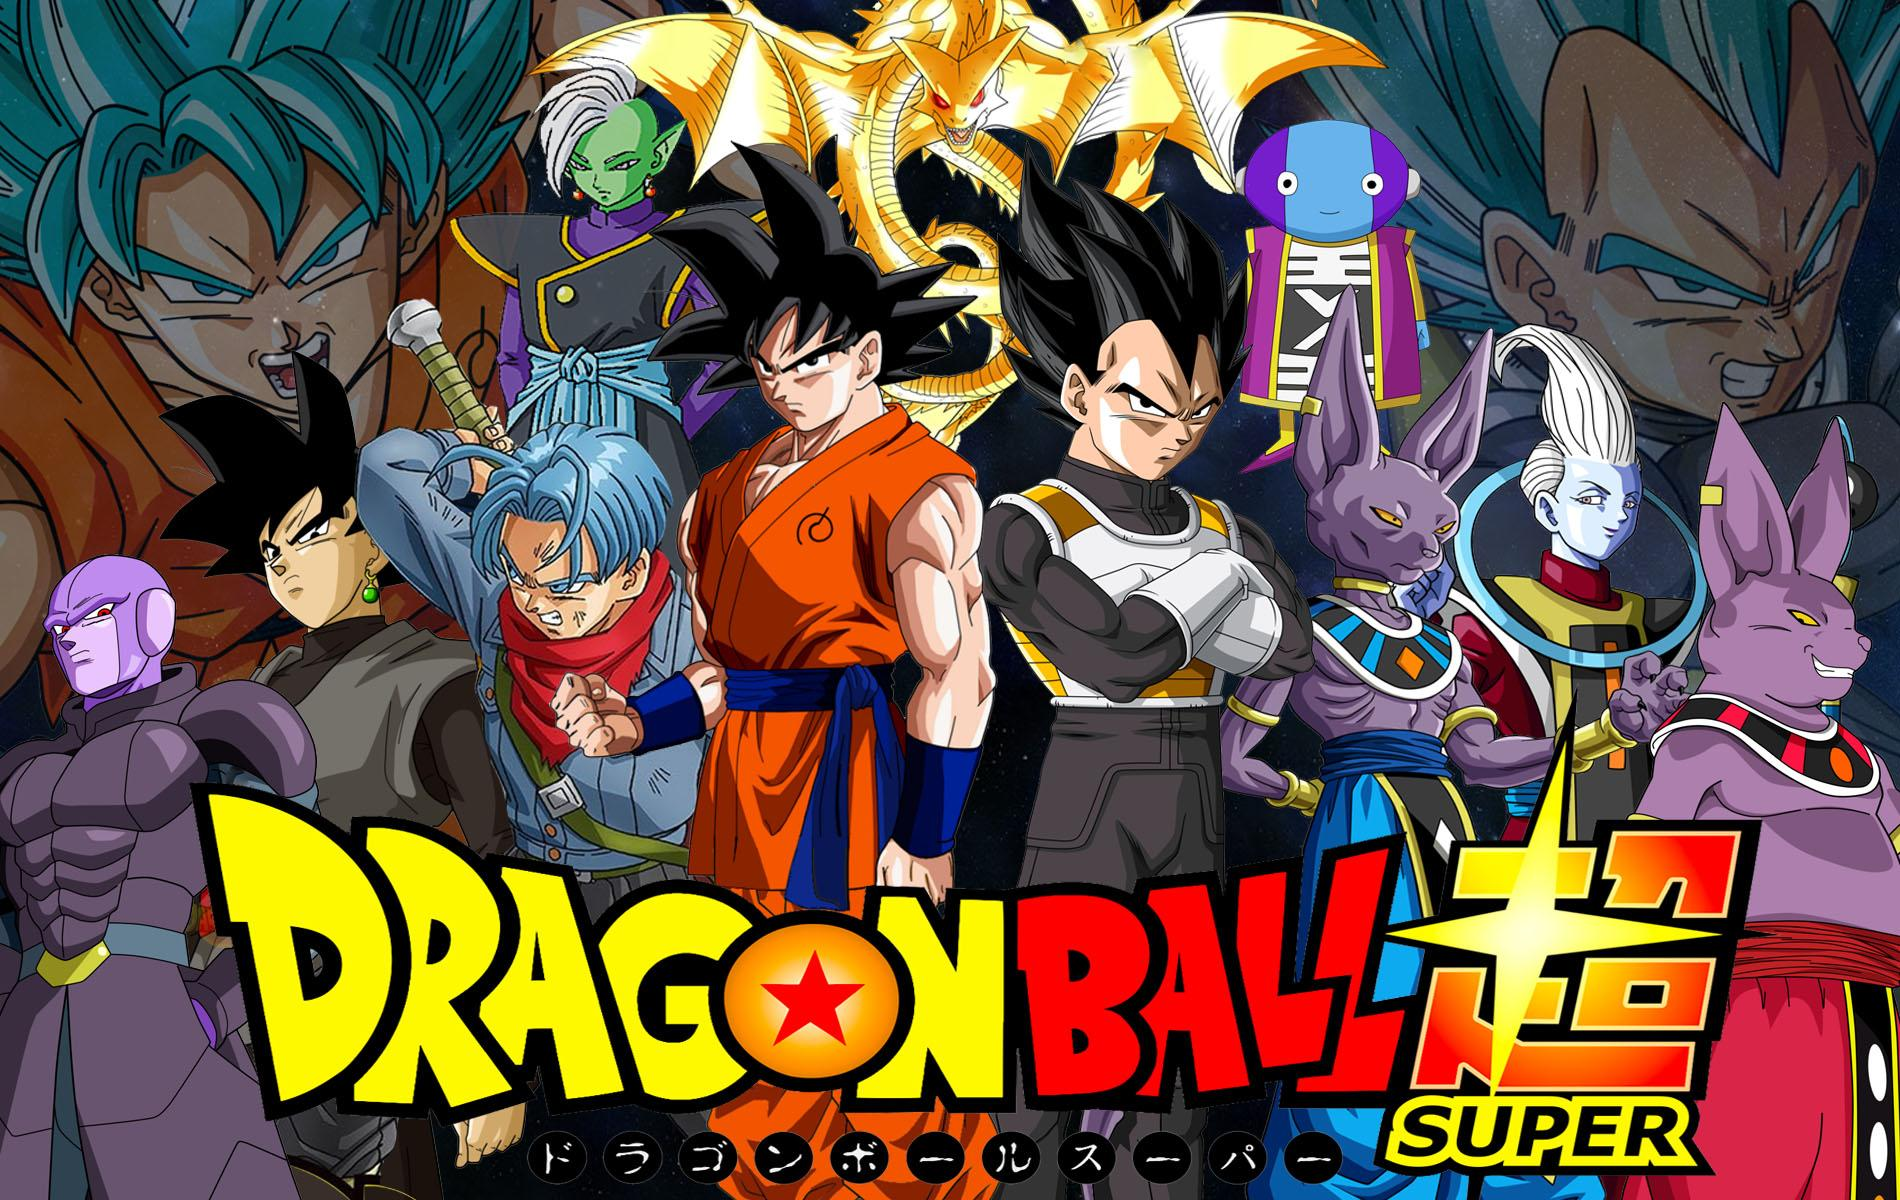 Fan recrea poster de Infinity War con personajes de Dragon Ball Super –  TierraGamer